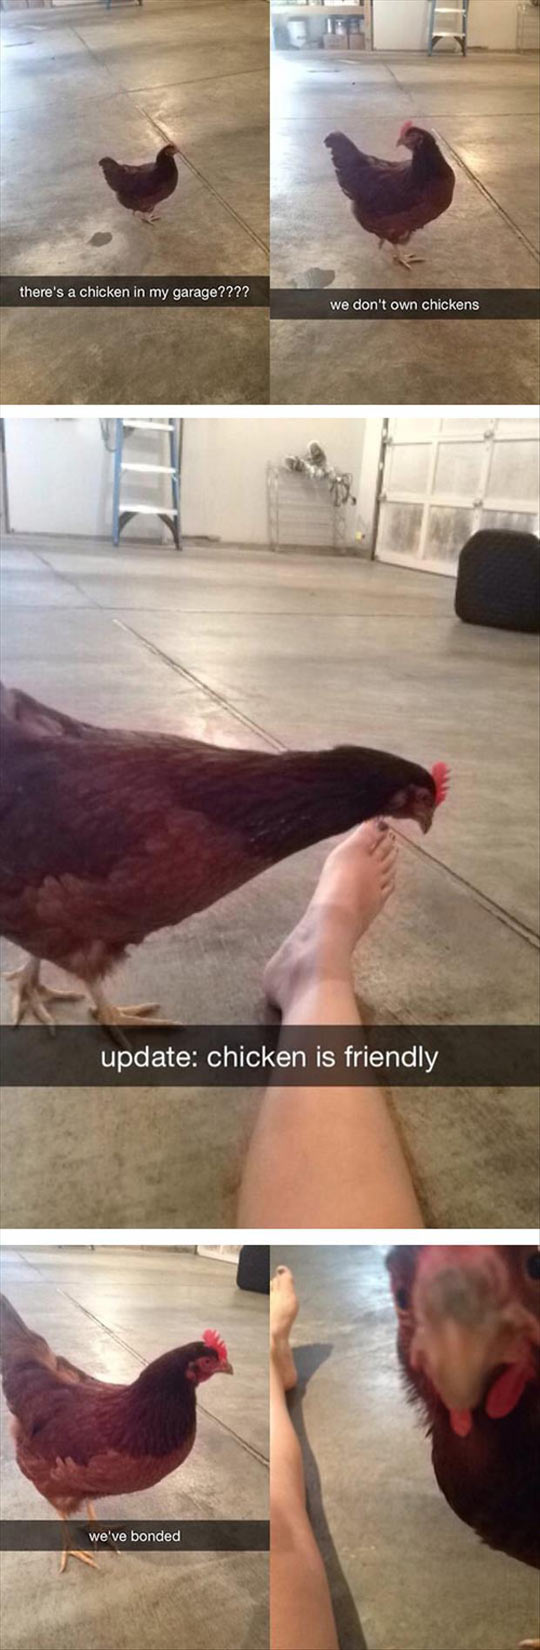 funny-friendly-chicken-garage-leg